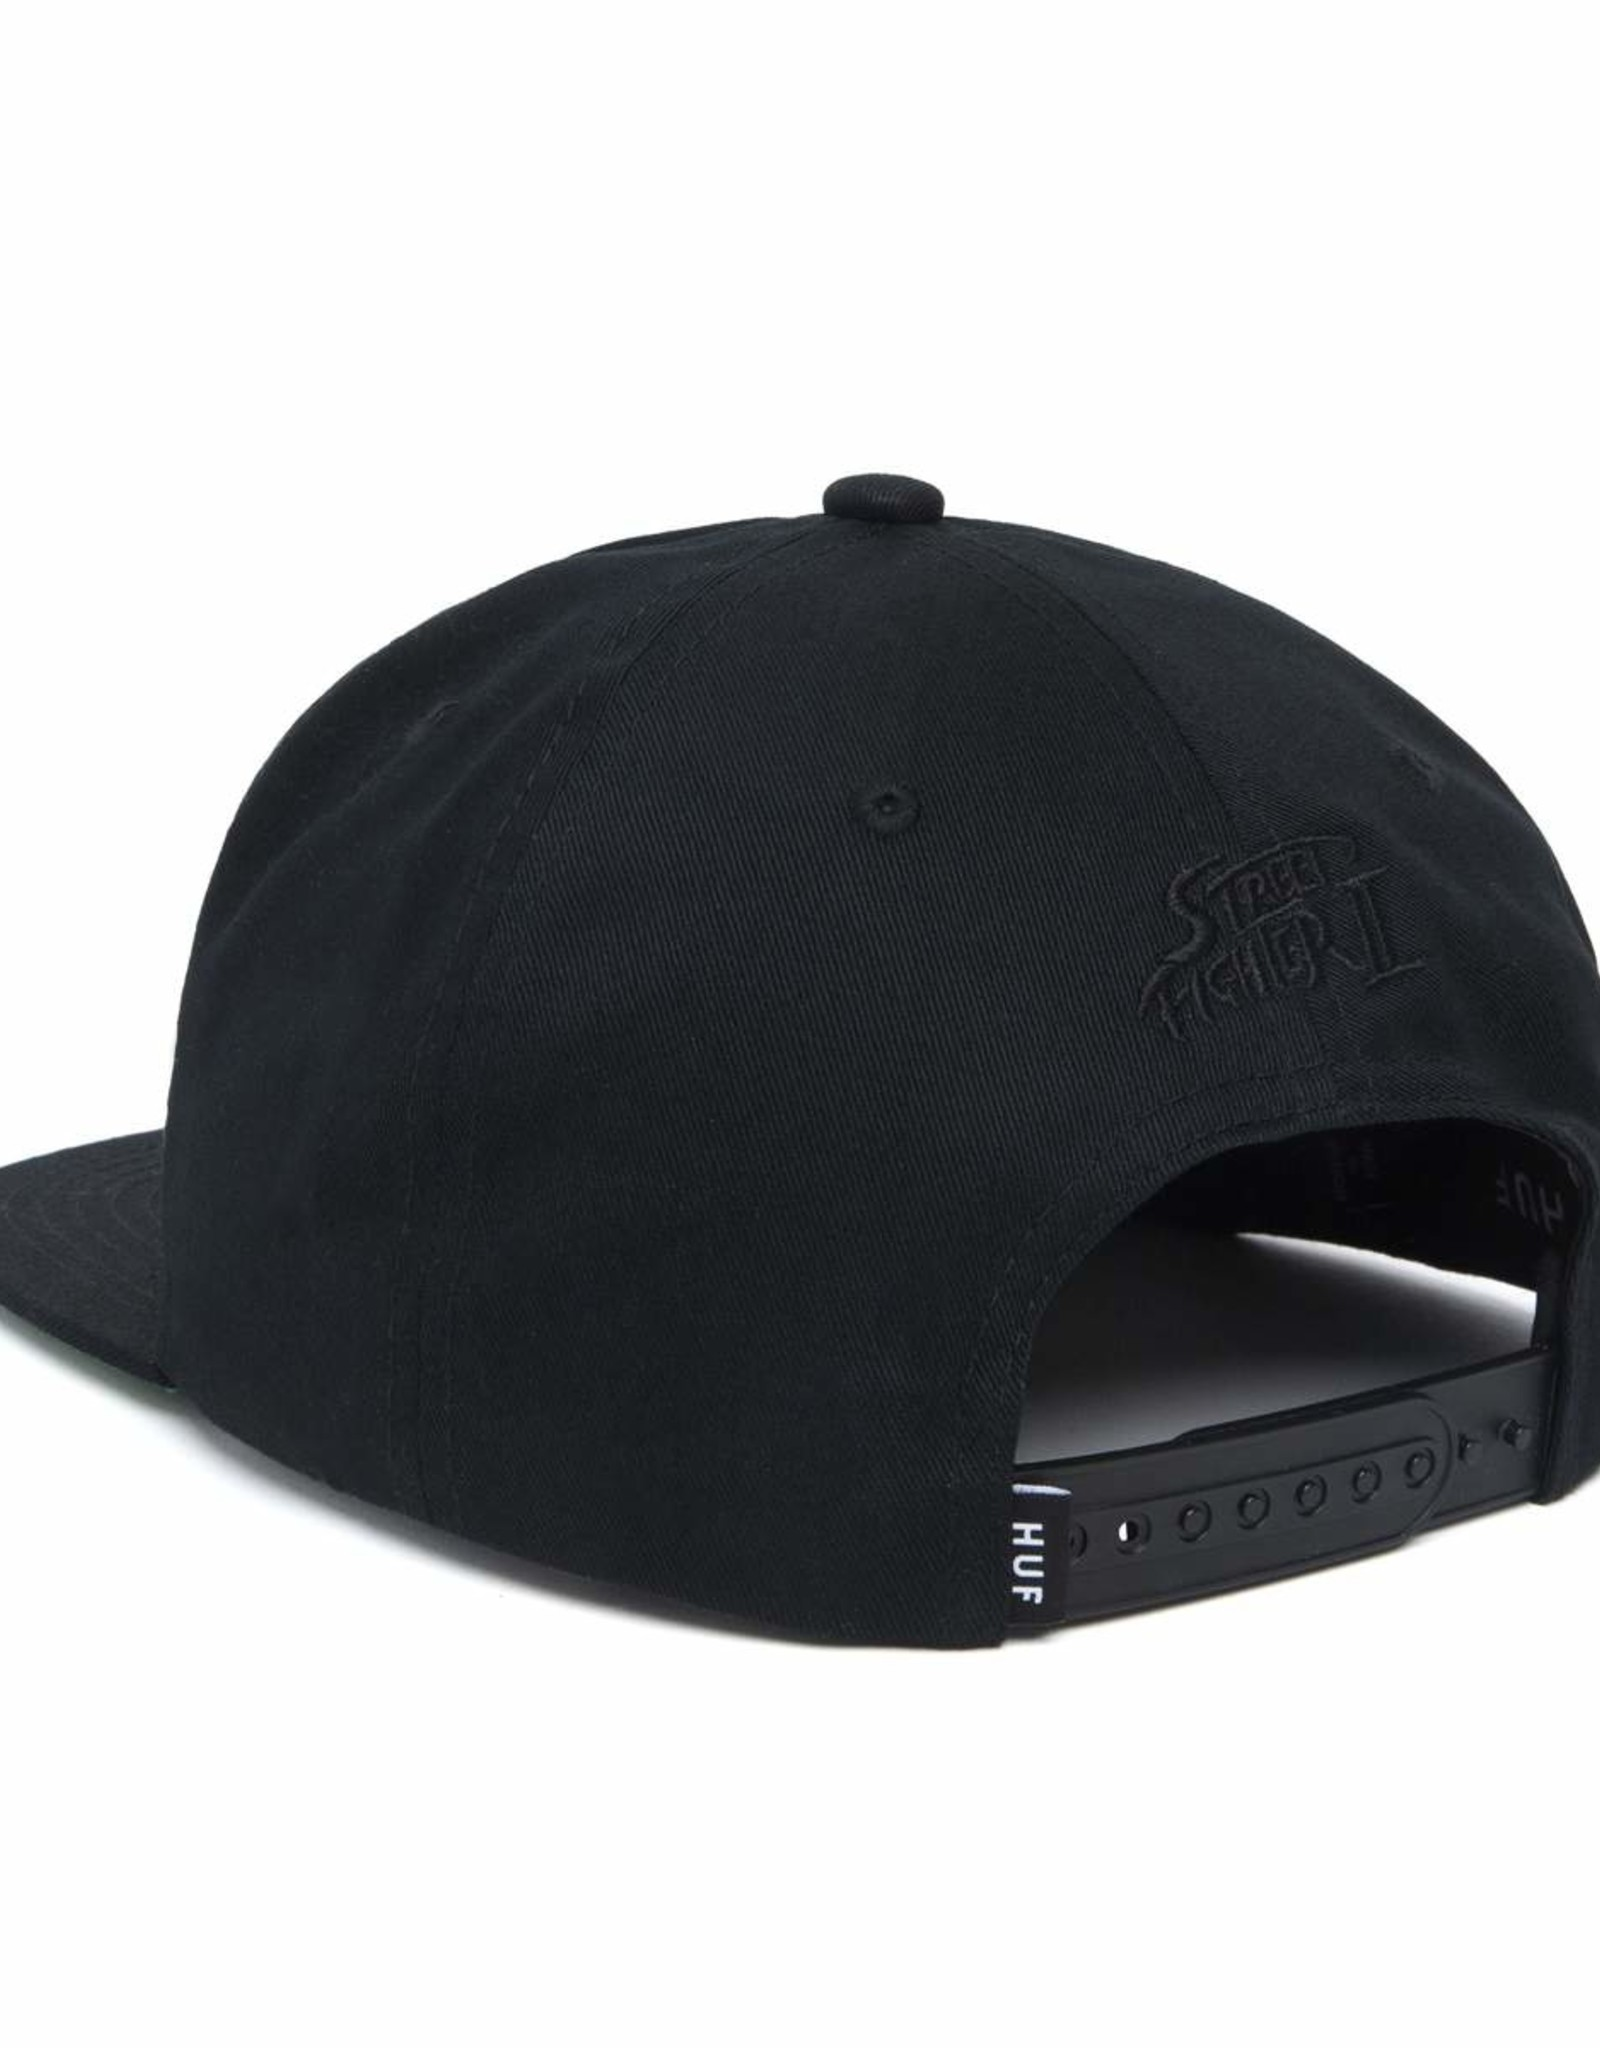 HUF CHUN-LI SNAPBACK HAT - BLACK